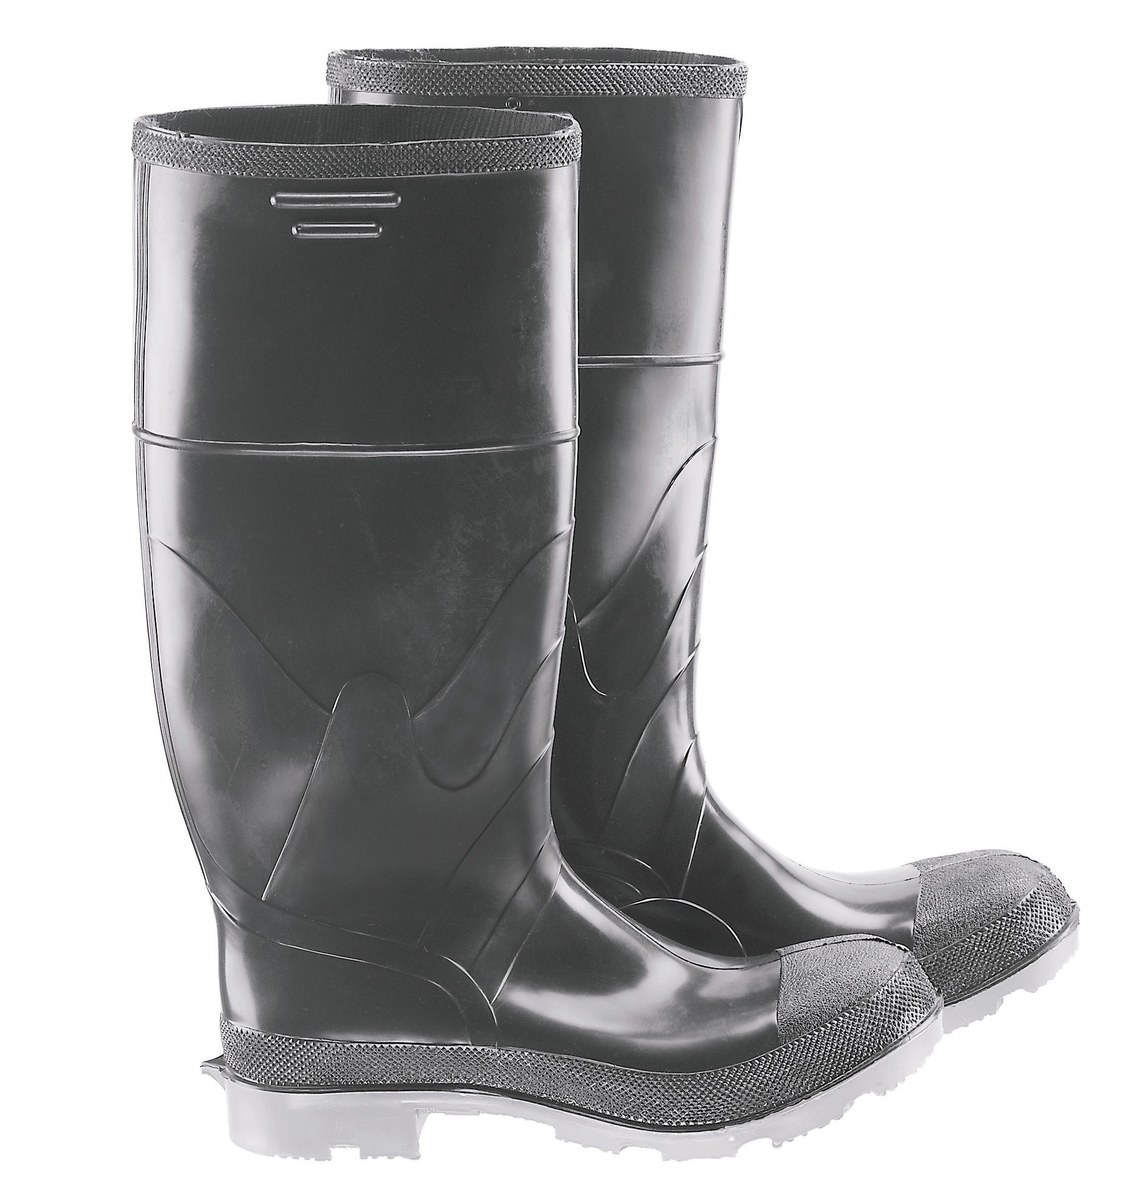 78bf10047e1 Dunlop Chemical-Resistant Boots 861010700, Size 7, Polyurethane/PVC ...